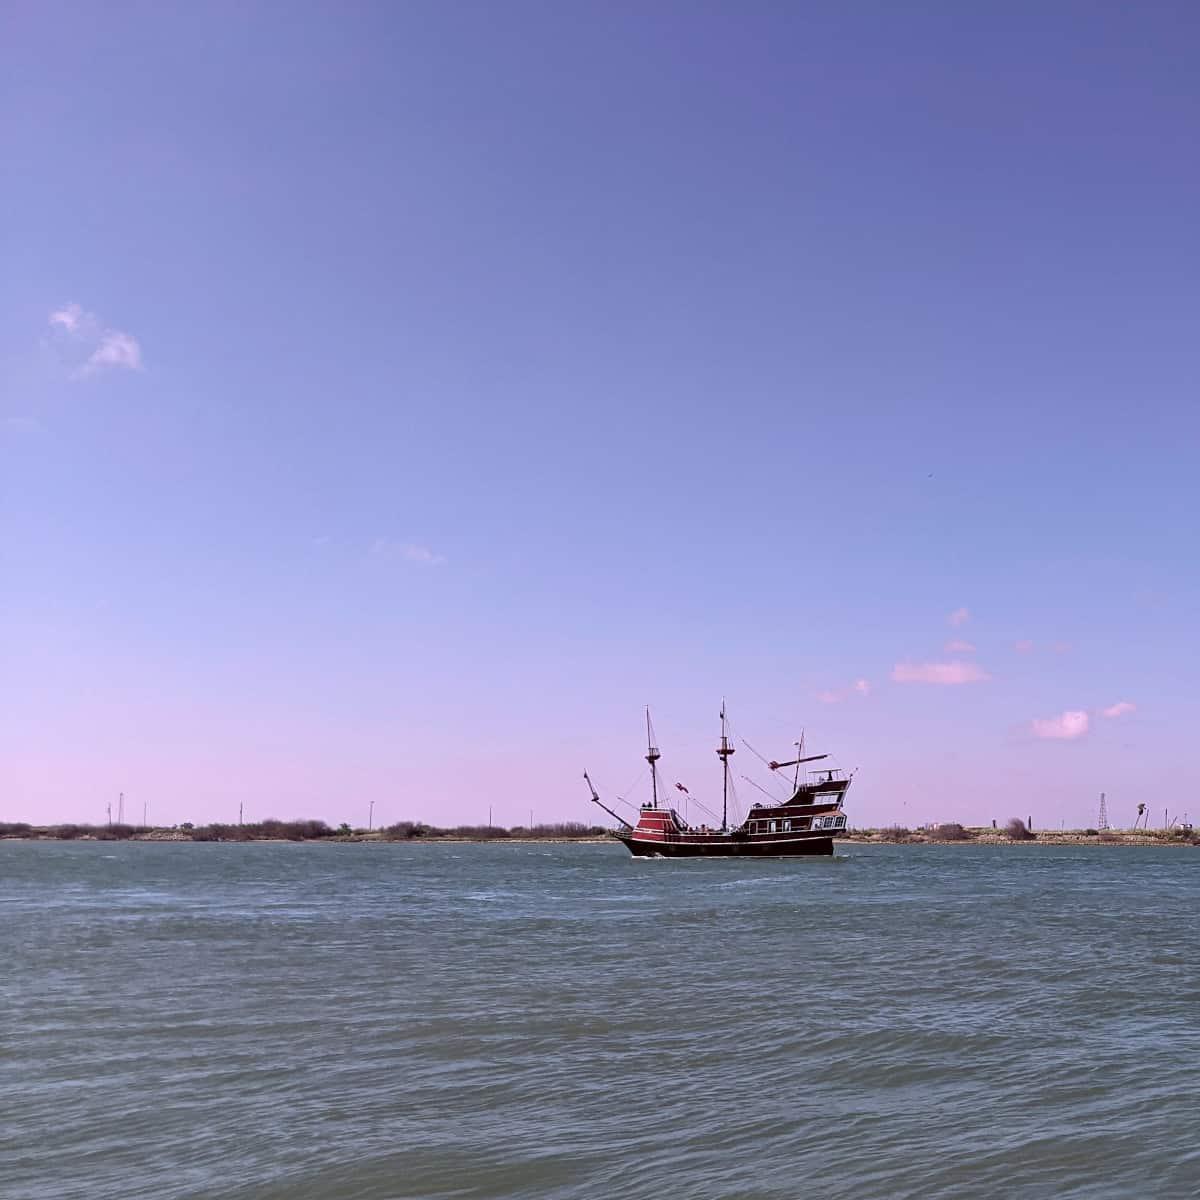 Port Aransas Pirate Ship